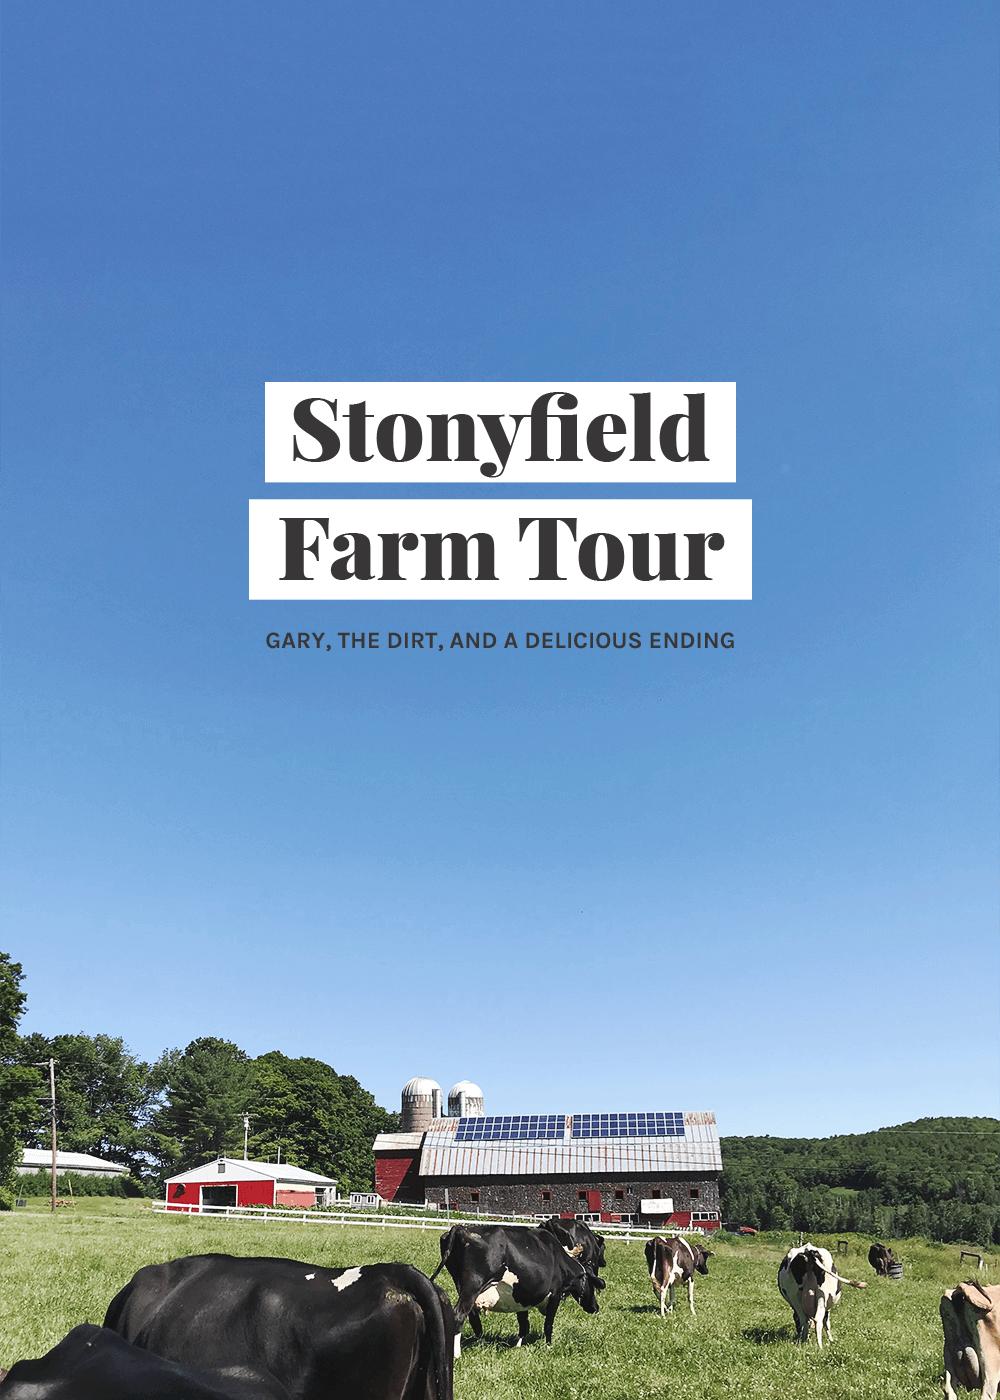 Stonyfield Farm Tour by The Fauxmartha